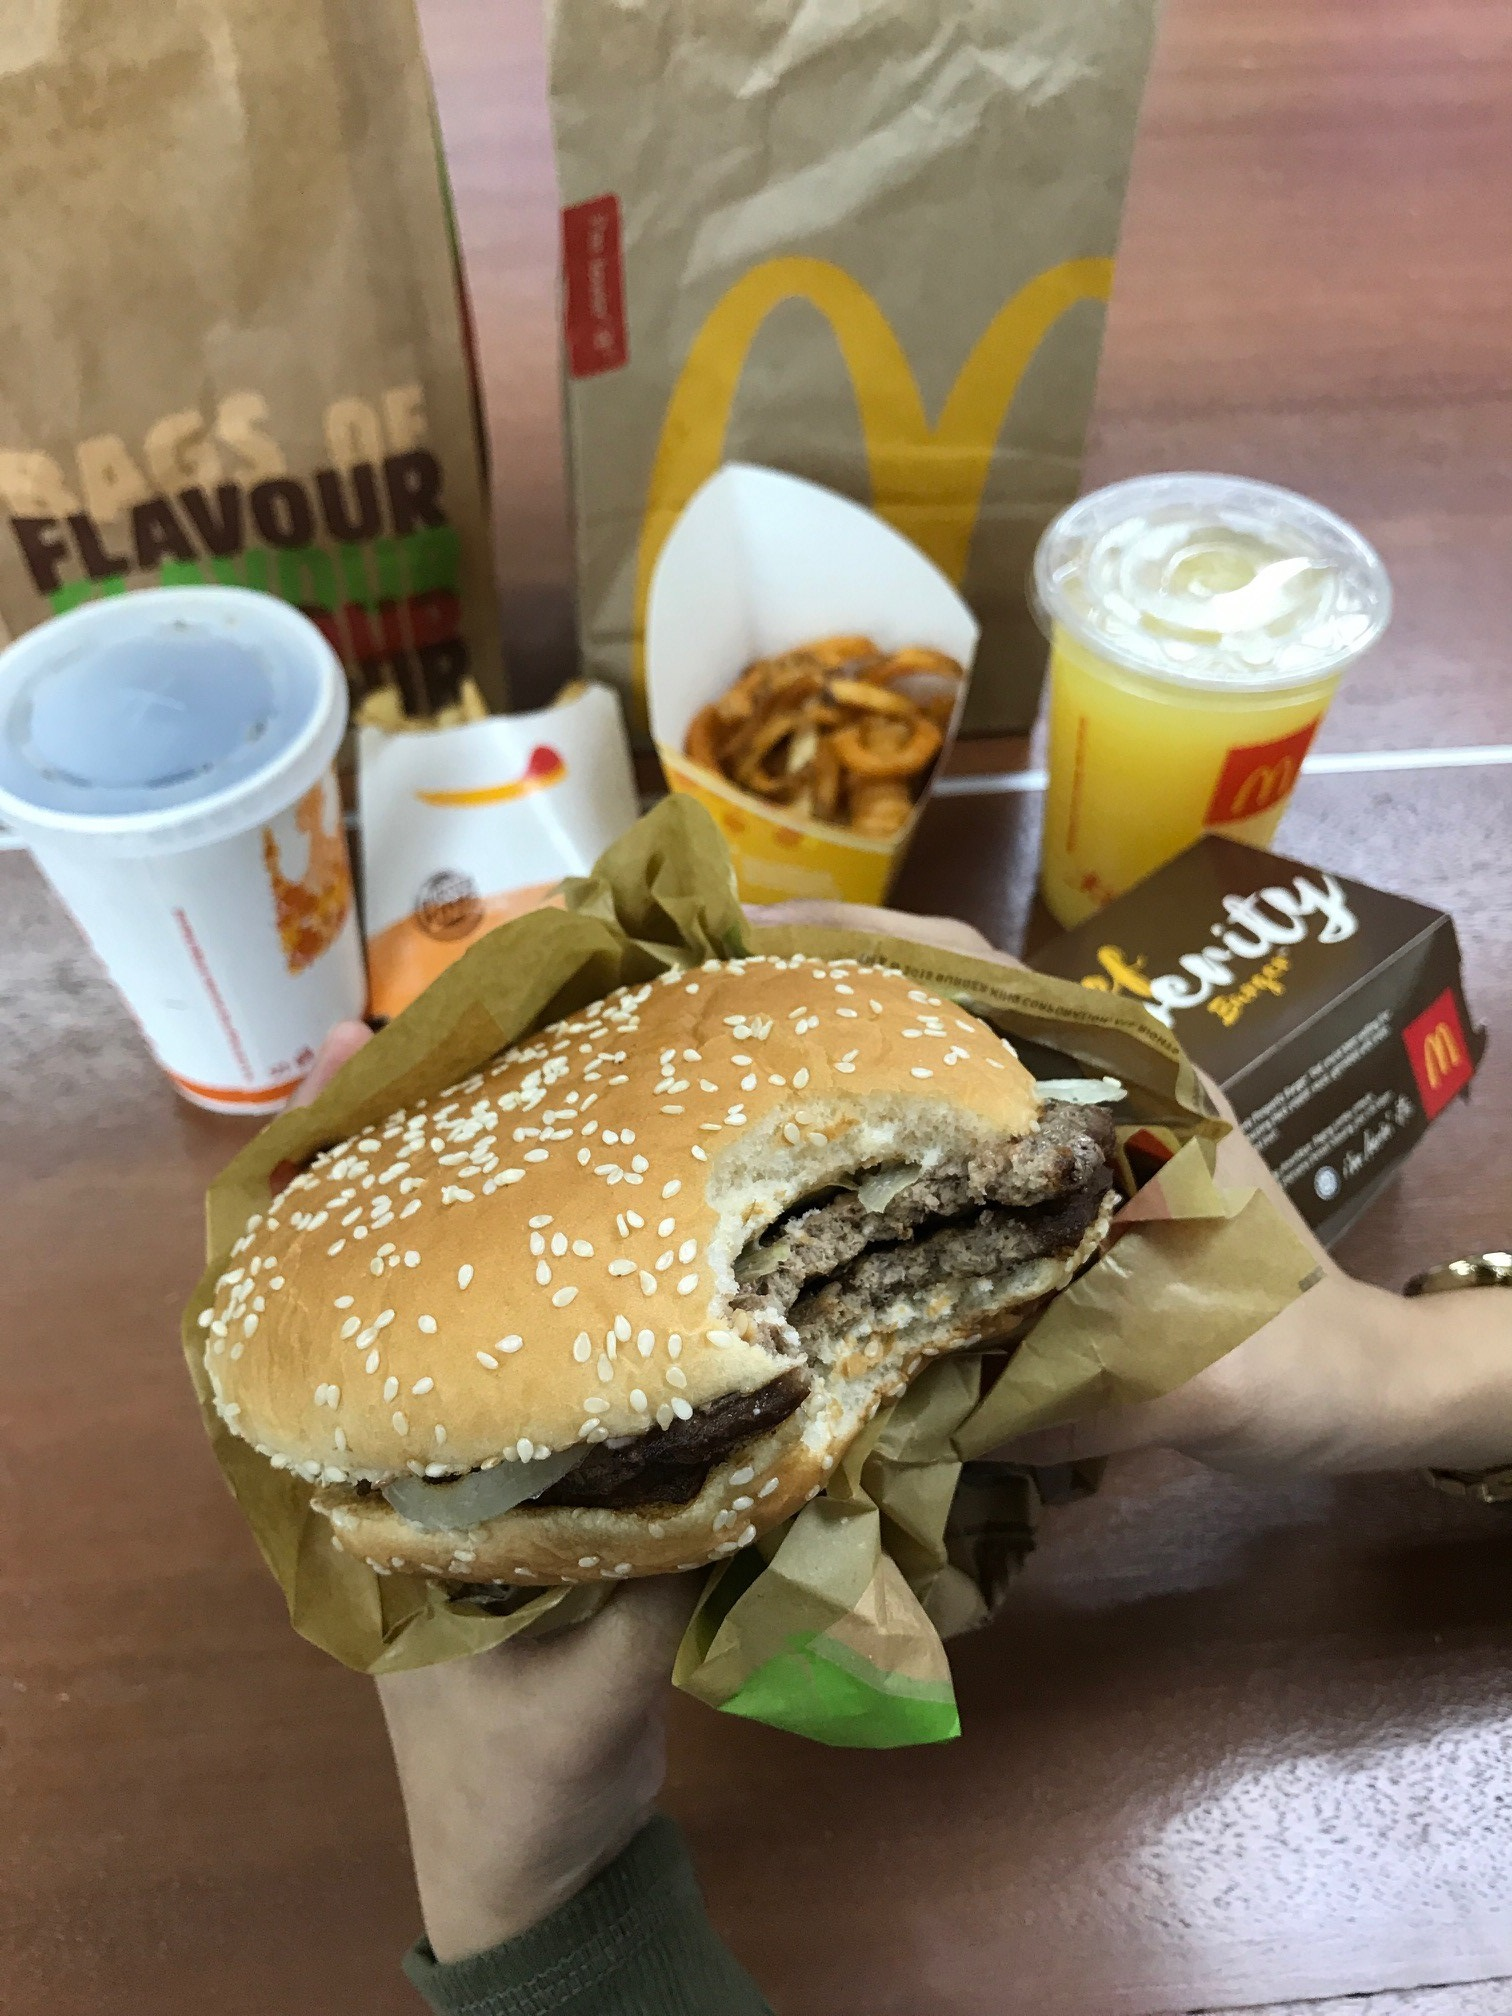 The classic Burger King Whopper burger taste.